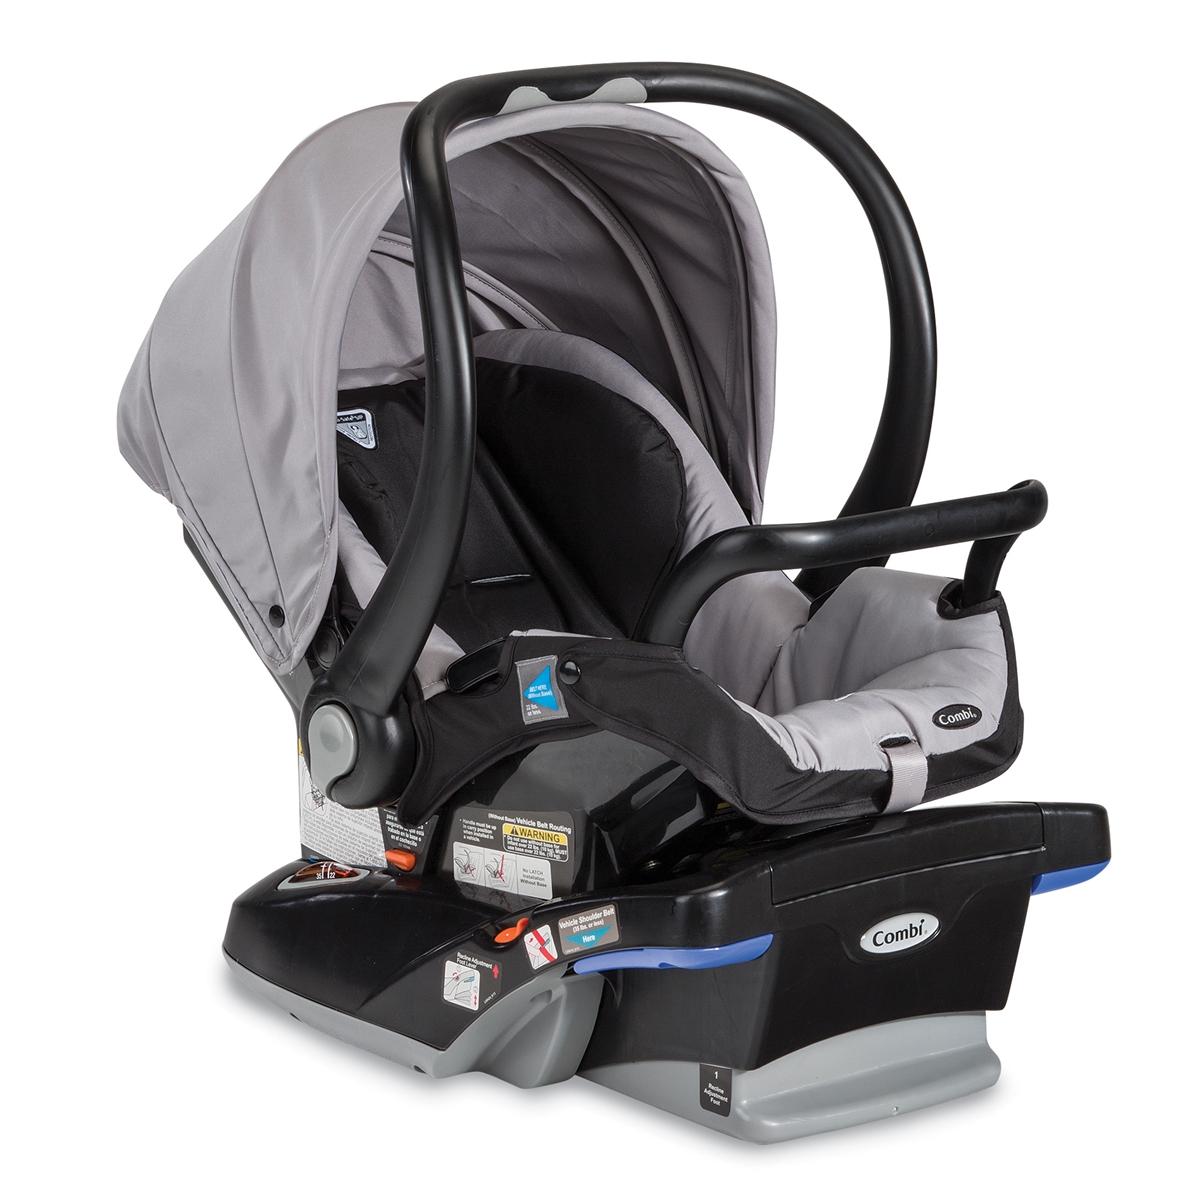 Combi Shuttle Car Seat Infant Stroller Travel System